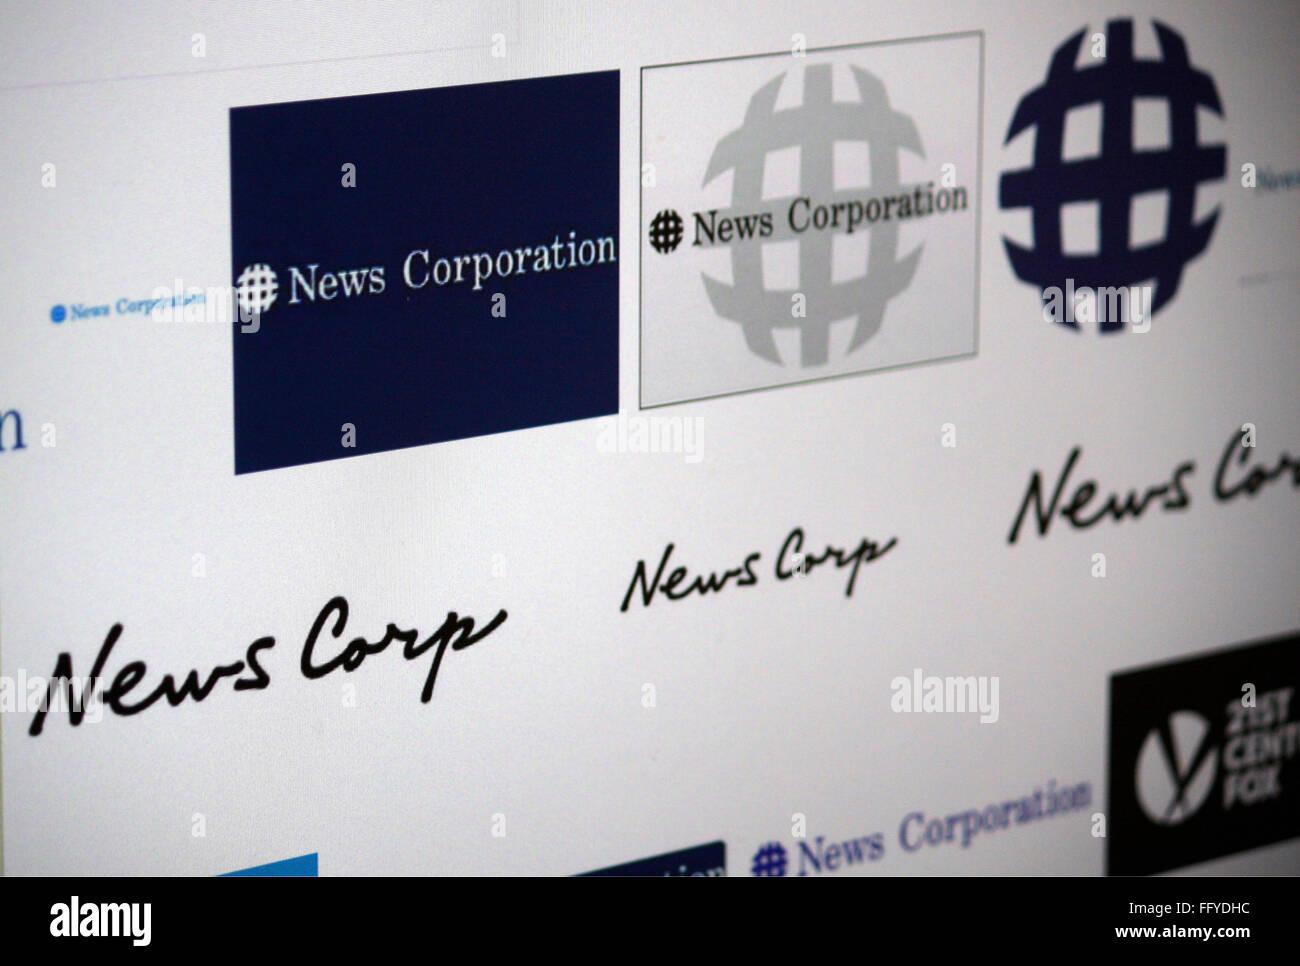 Markenname: 'News Corporation'. - Stock Image